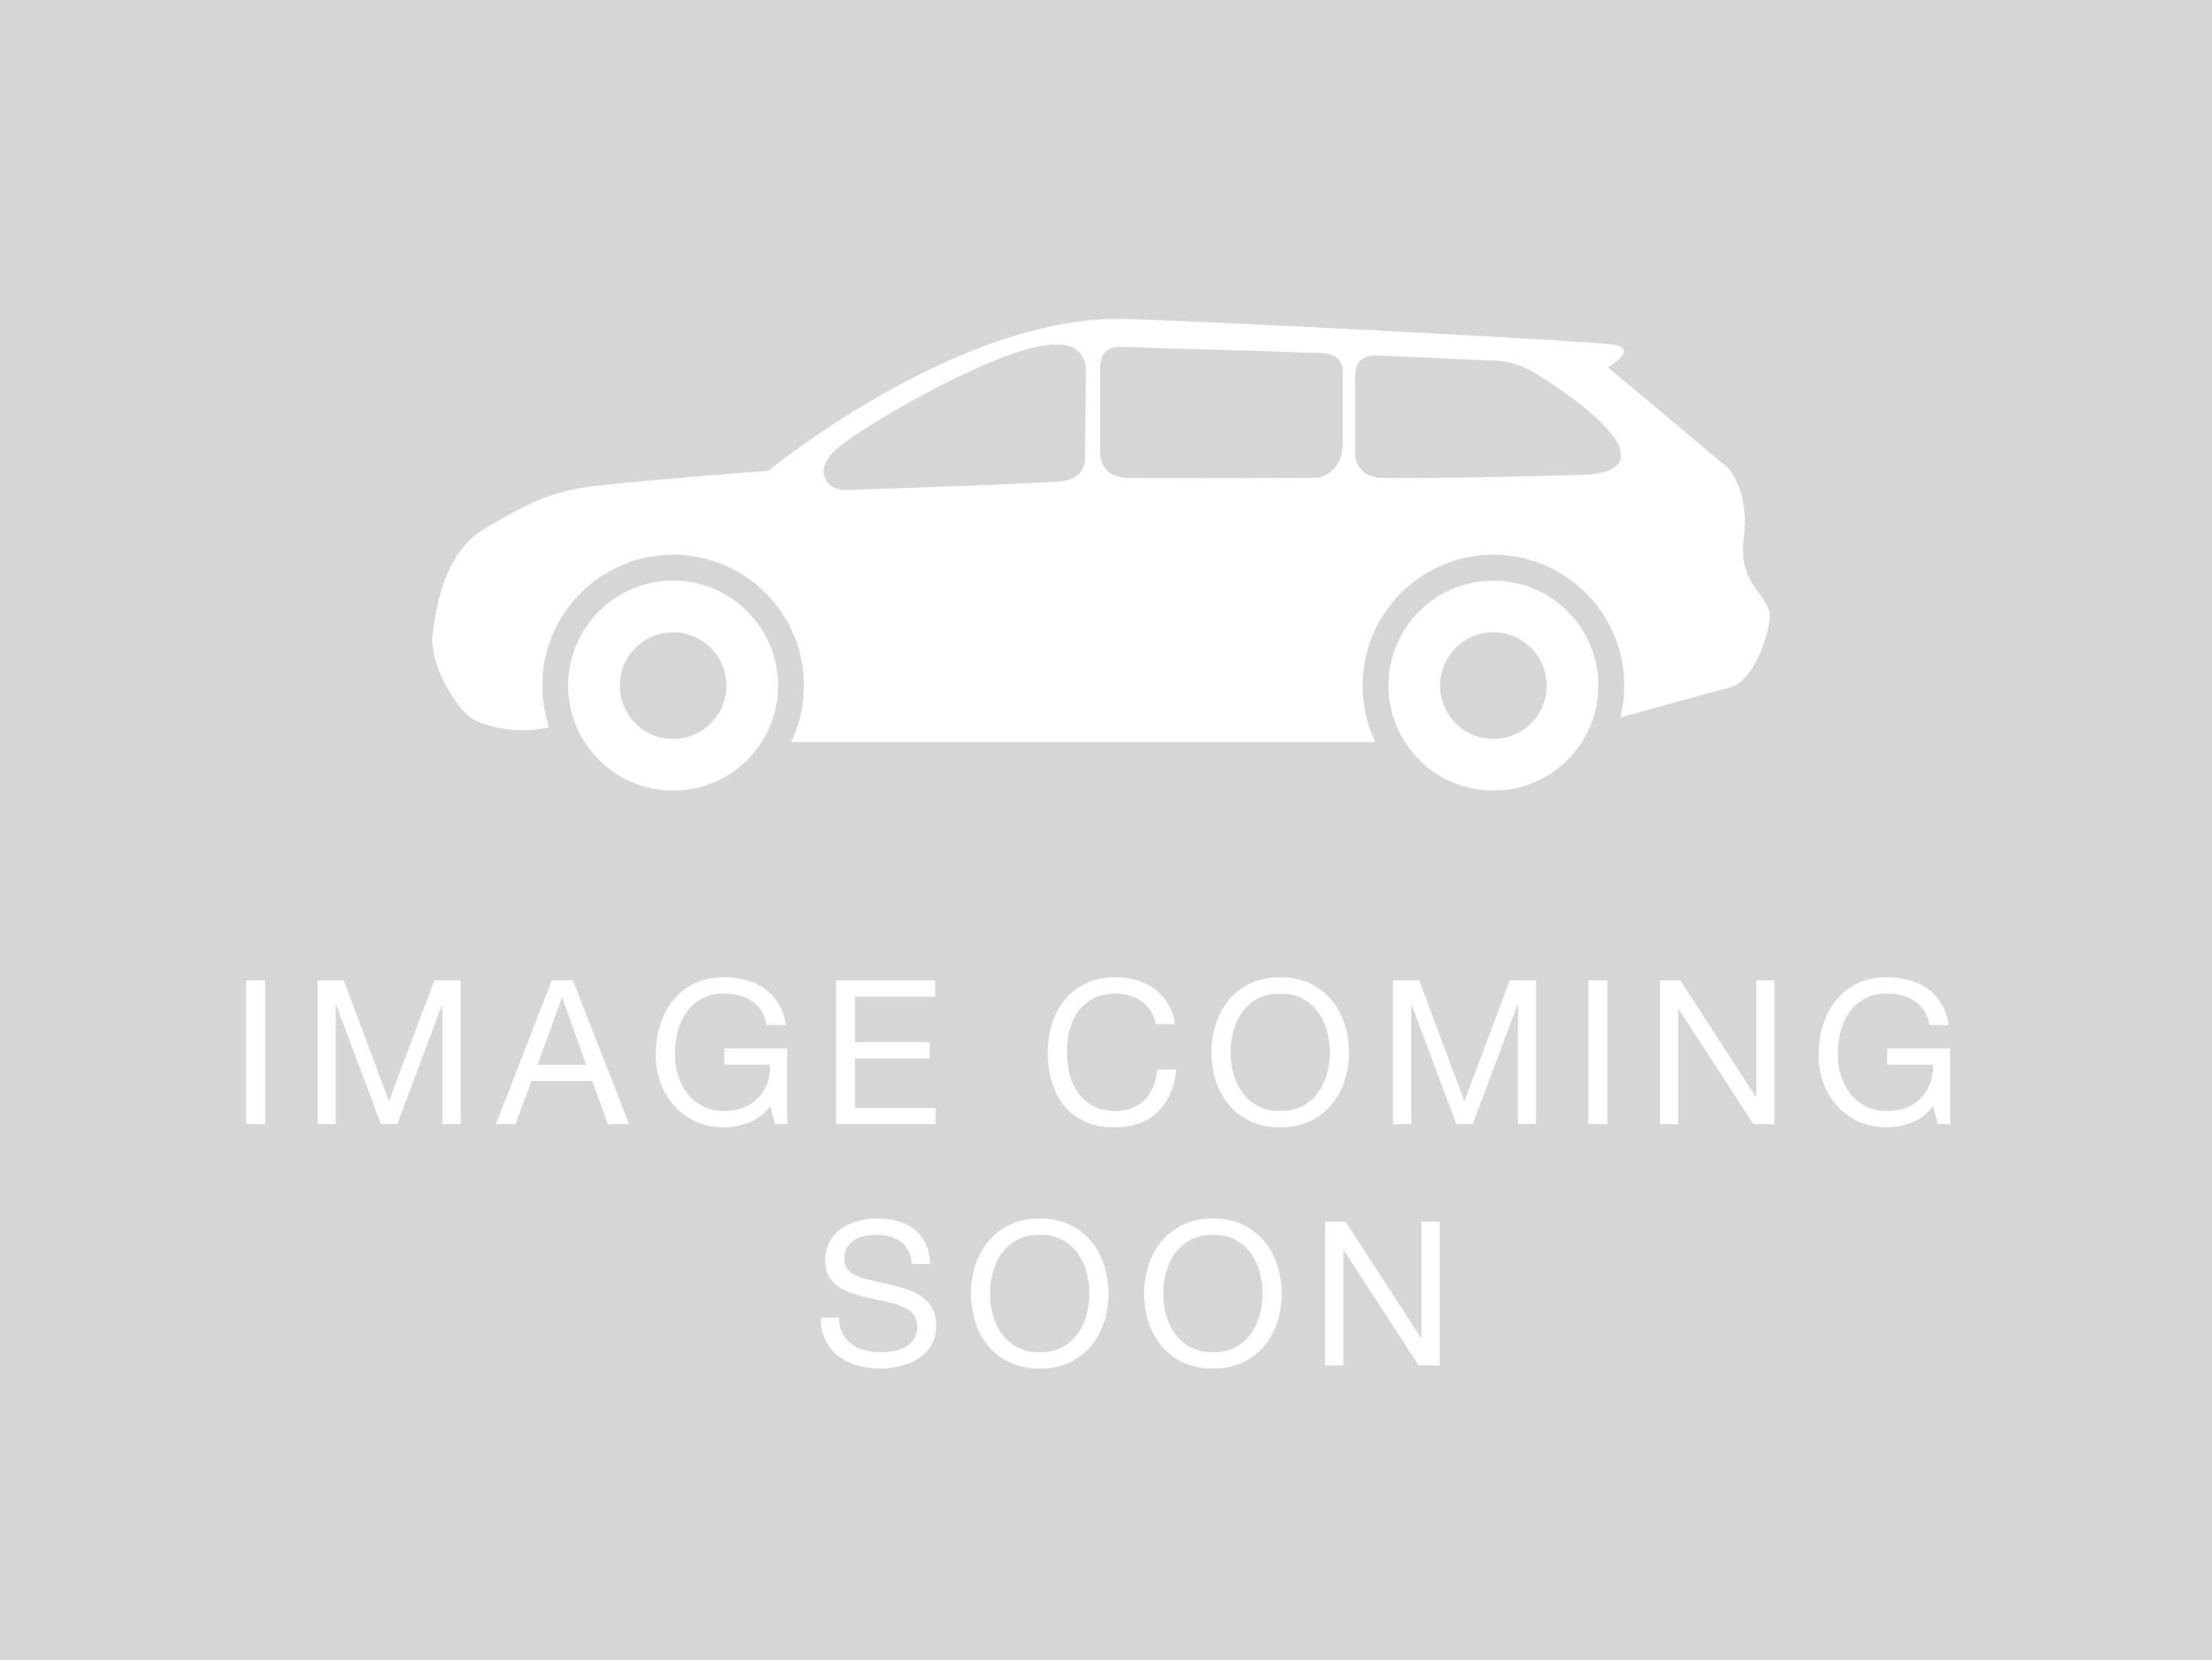 Honda Civic 2012. Retail Price